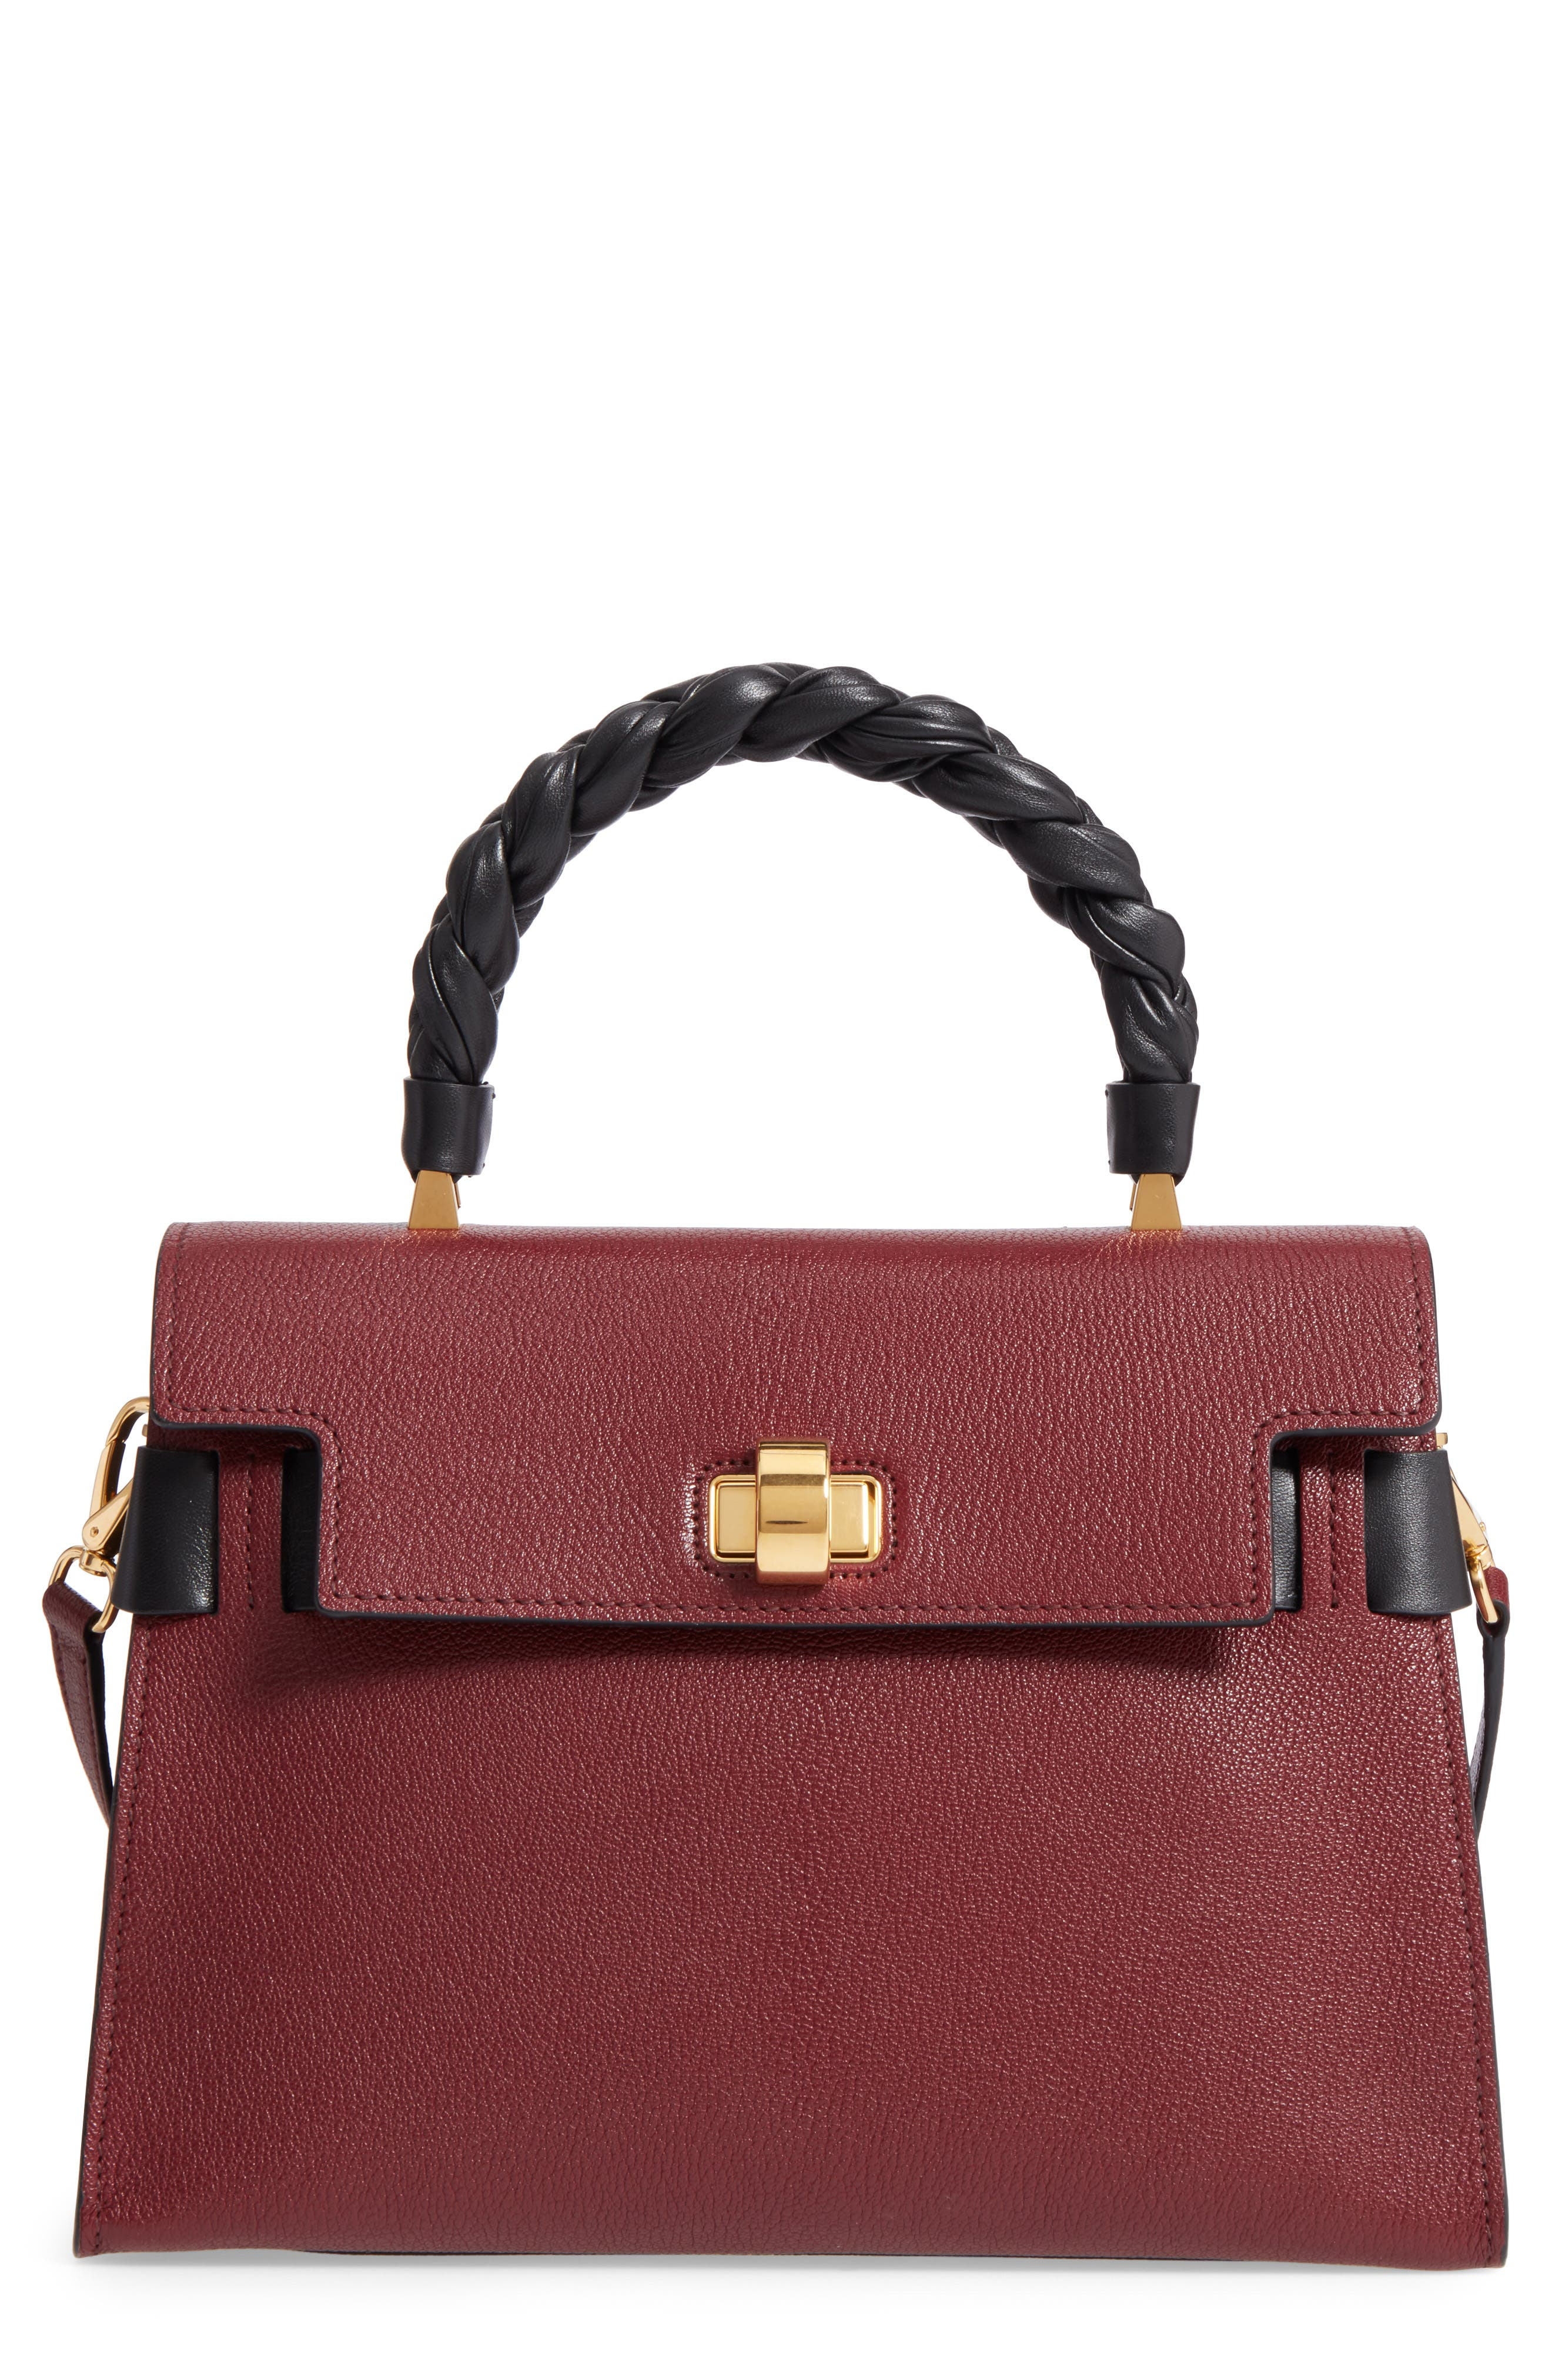 Miu Miu Madras Click Goatskin Leather Satchel